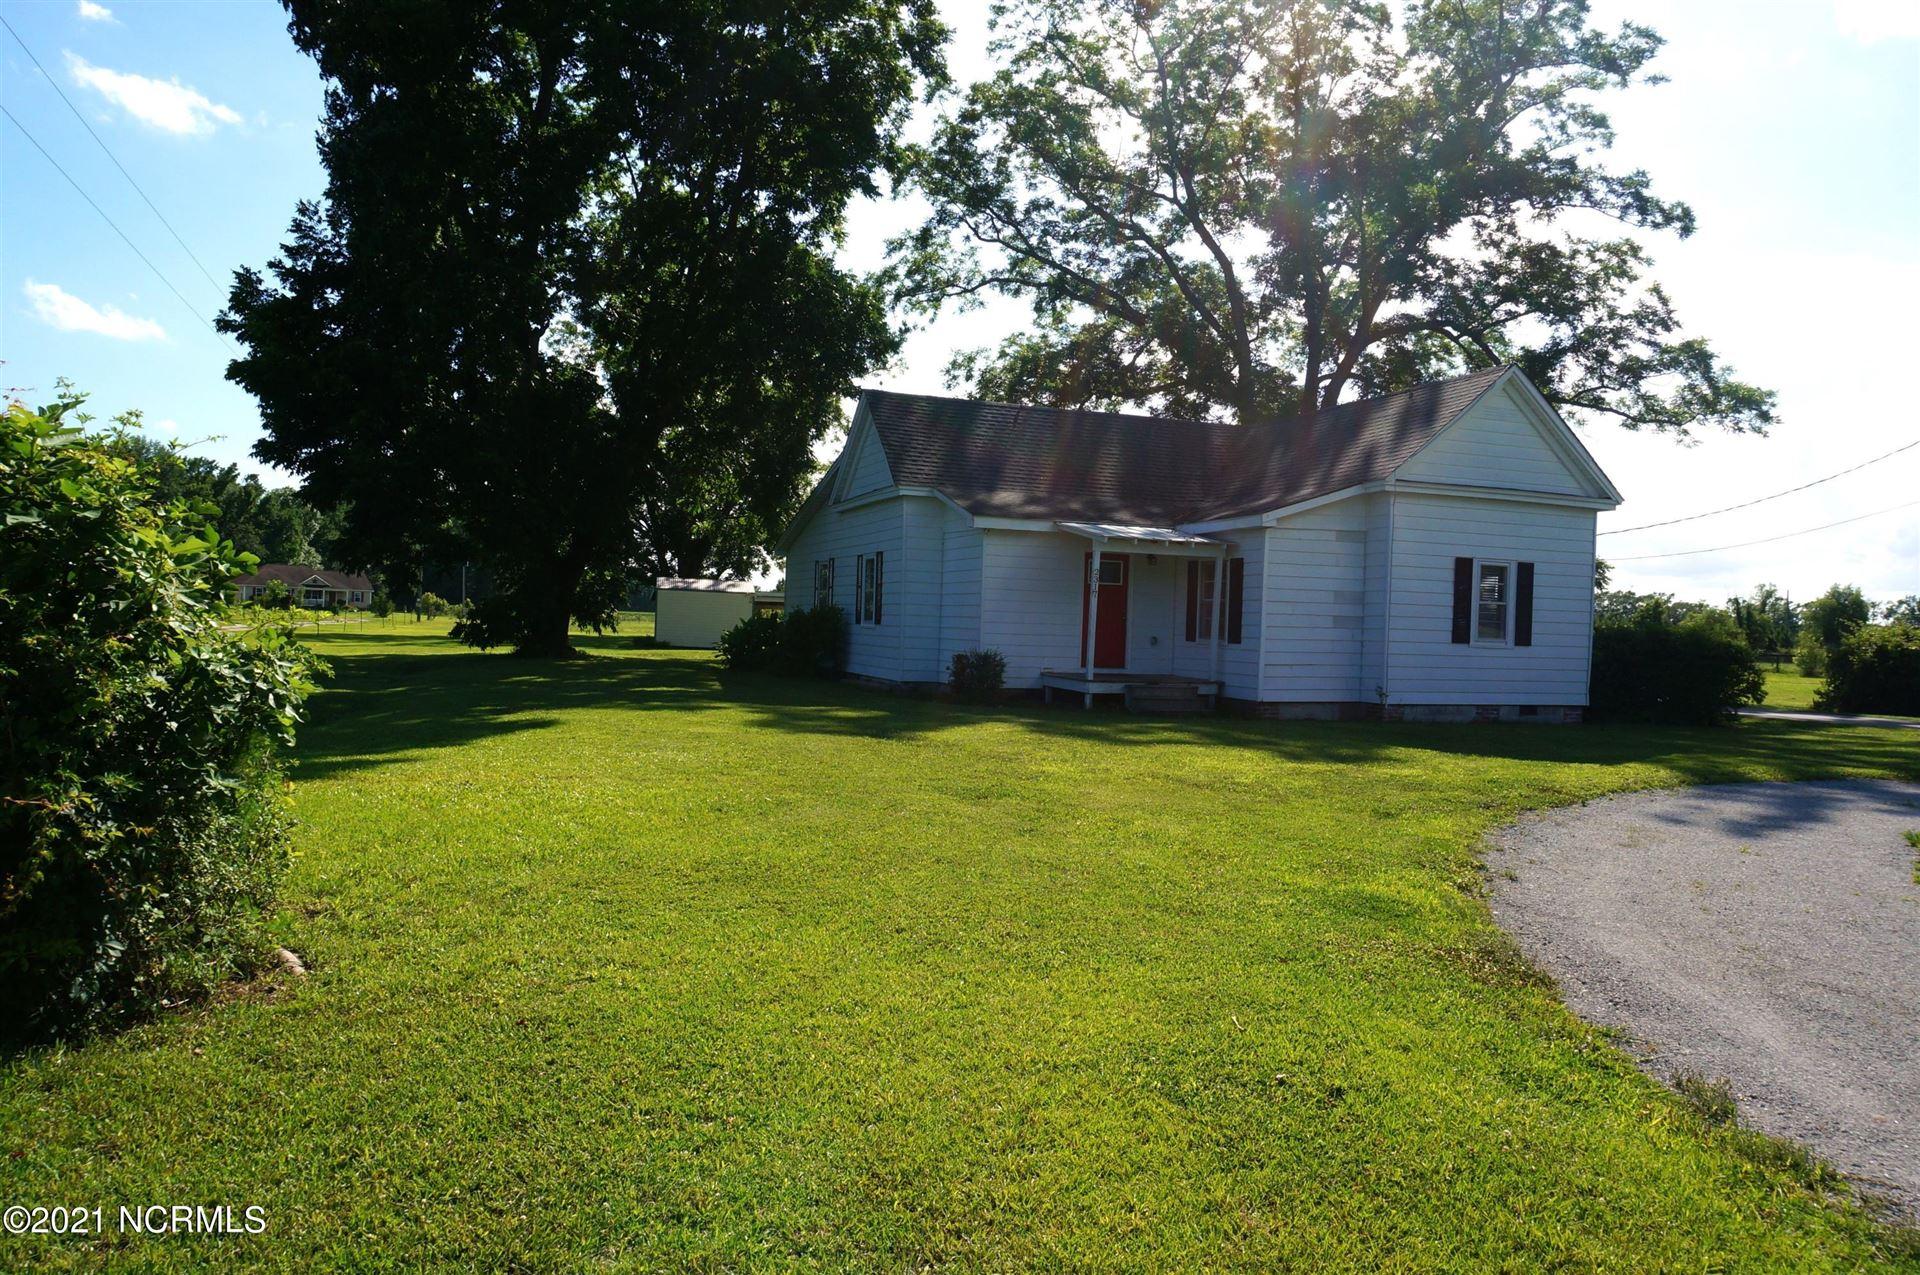 Photo of 2317 White Oak River Road, Maysville, NC 28555 (MLS # 100279291)